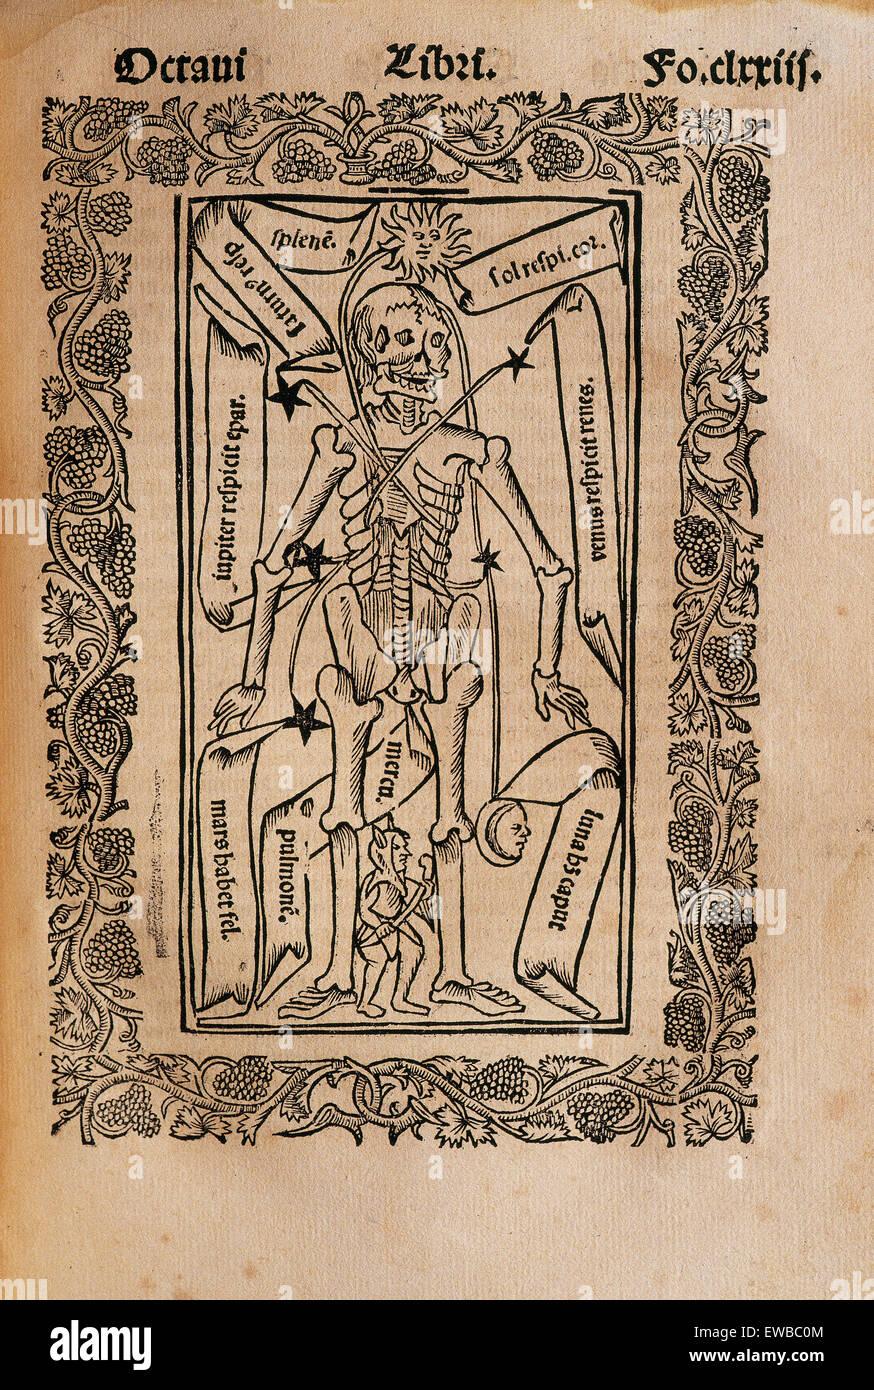 Ramon Llull (1235-1316). Spanish writer and philosopher.  Practica Compendiosa Artis Raymundi Lulli, 1523. Book - Stock Image